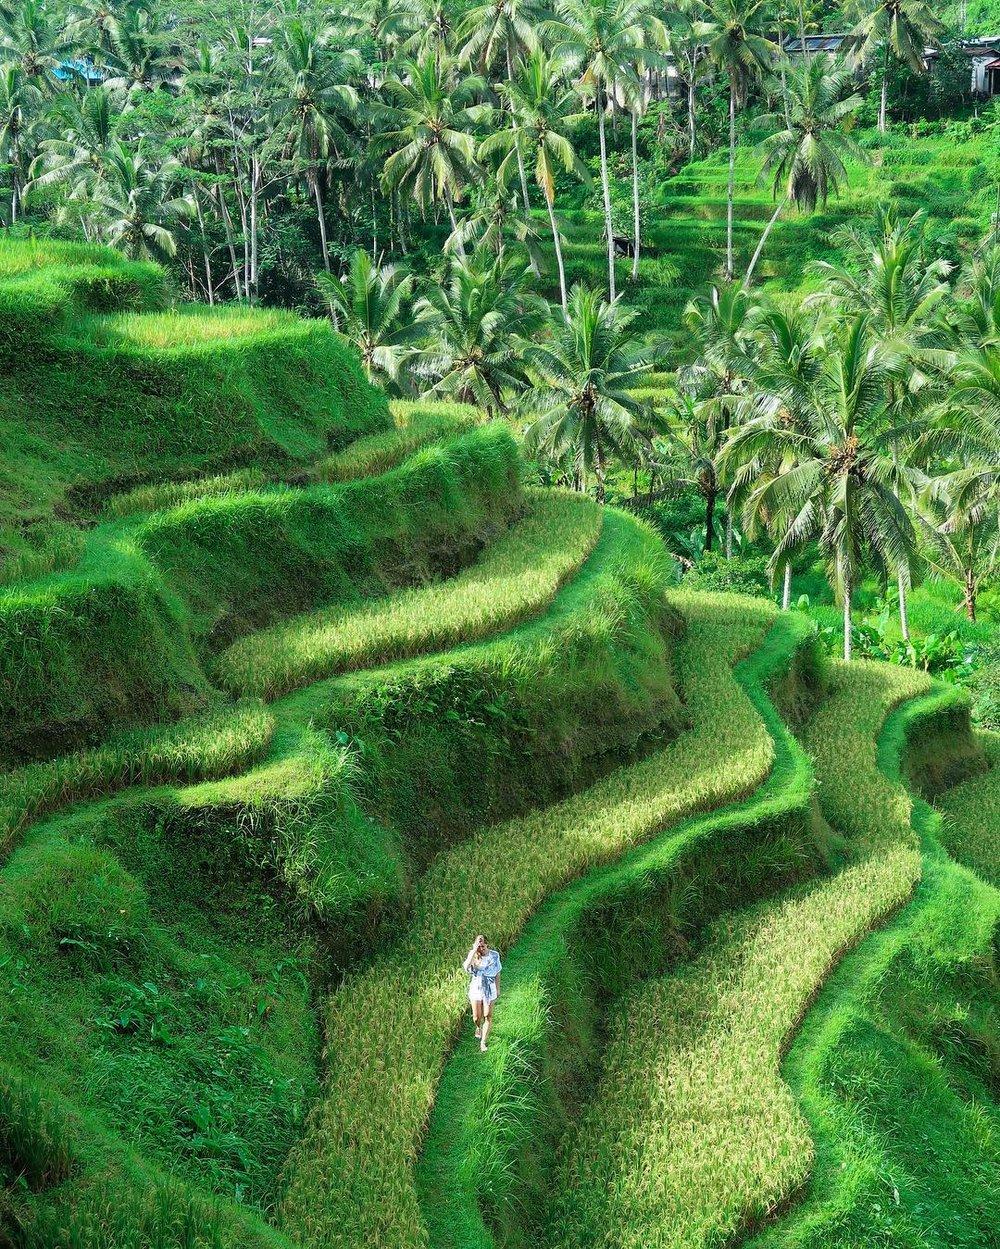 Tegallalang Rice Terrace - Ubud, Bali - Elise Darma